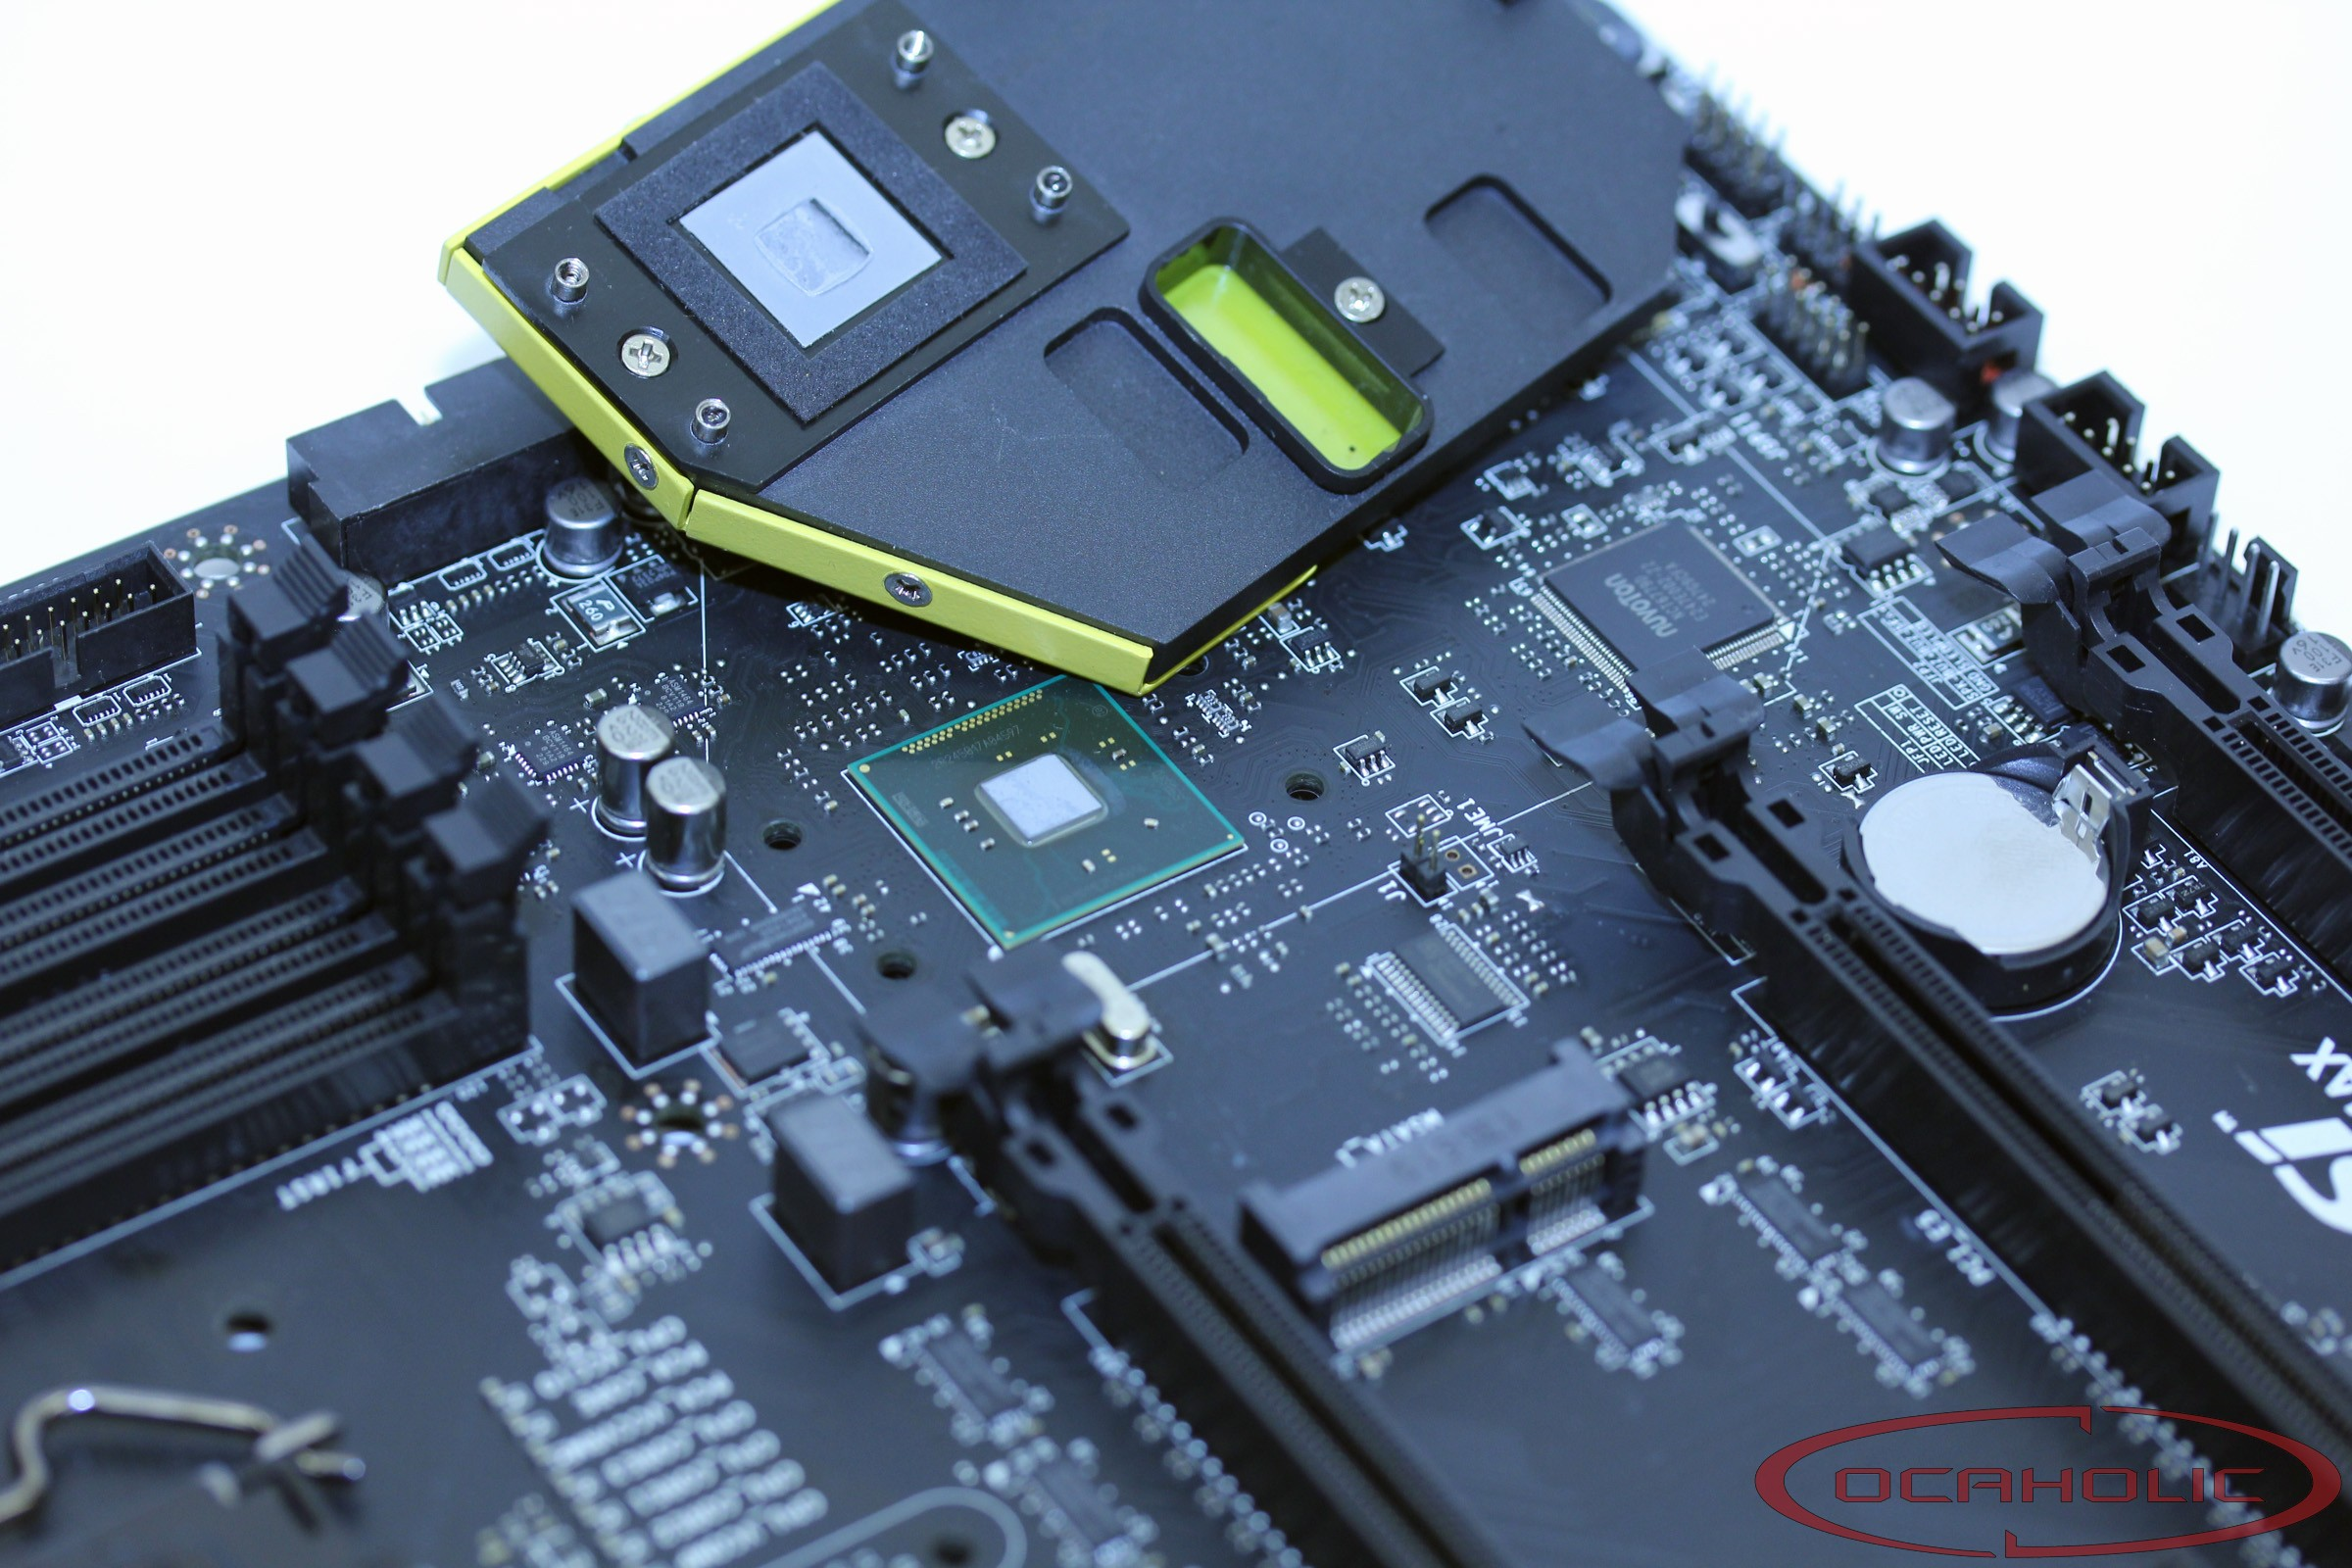 MSI  Z87 MPOWER MAX BIOS CHIP